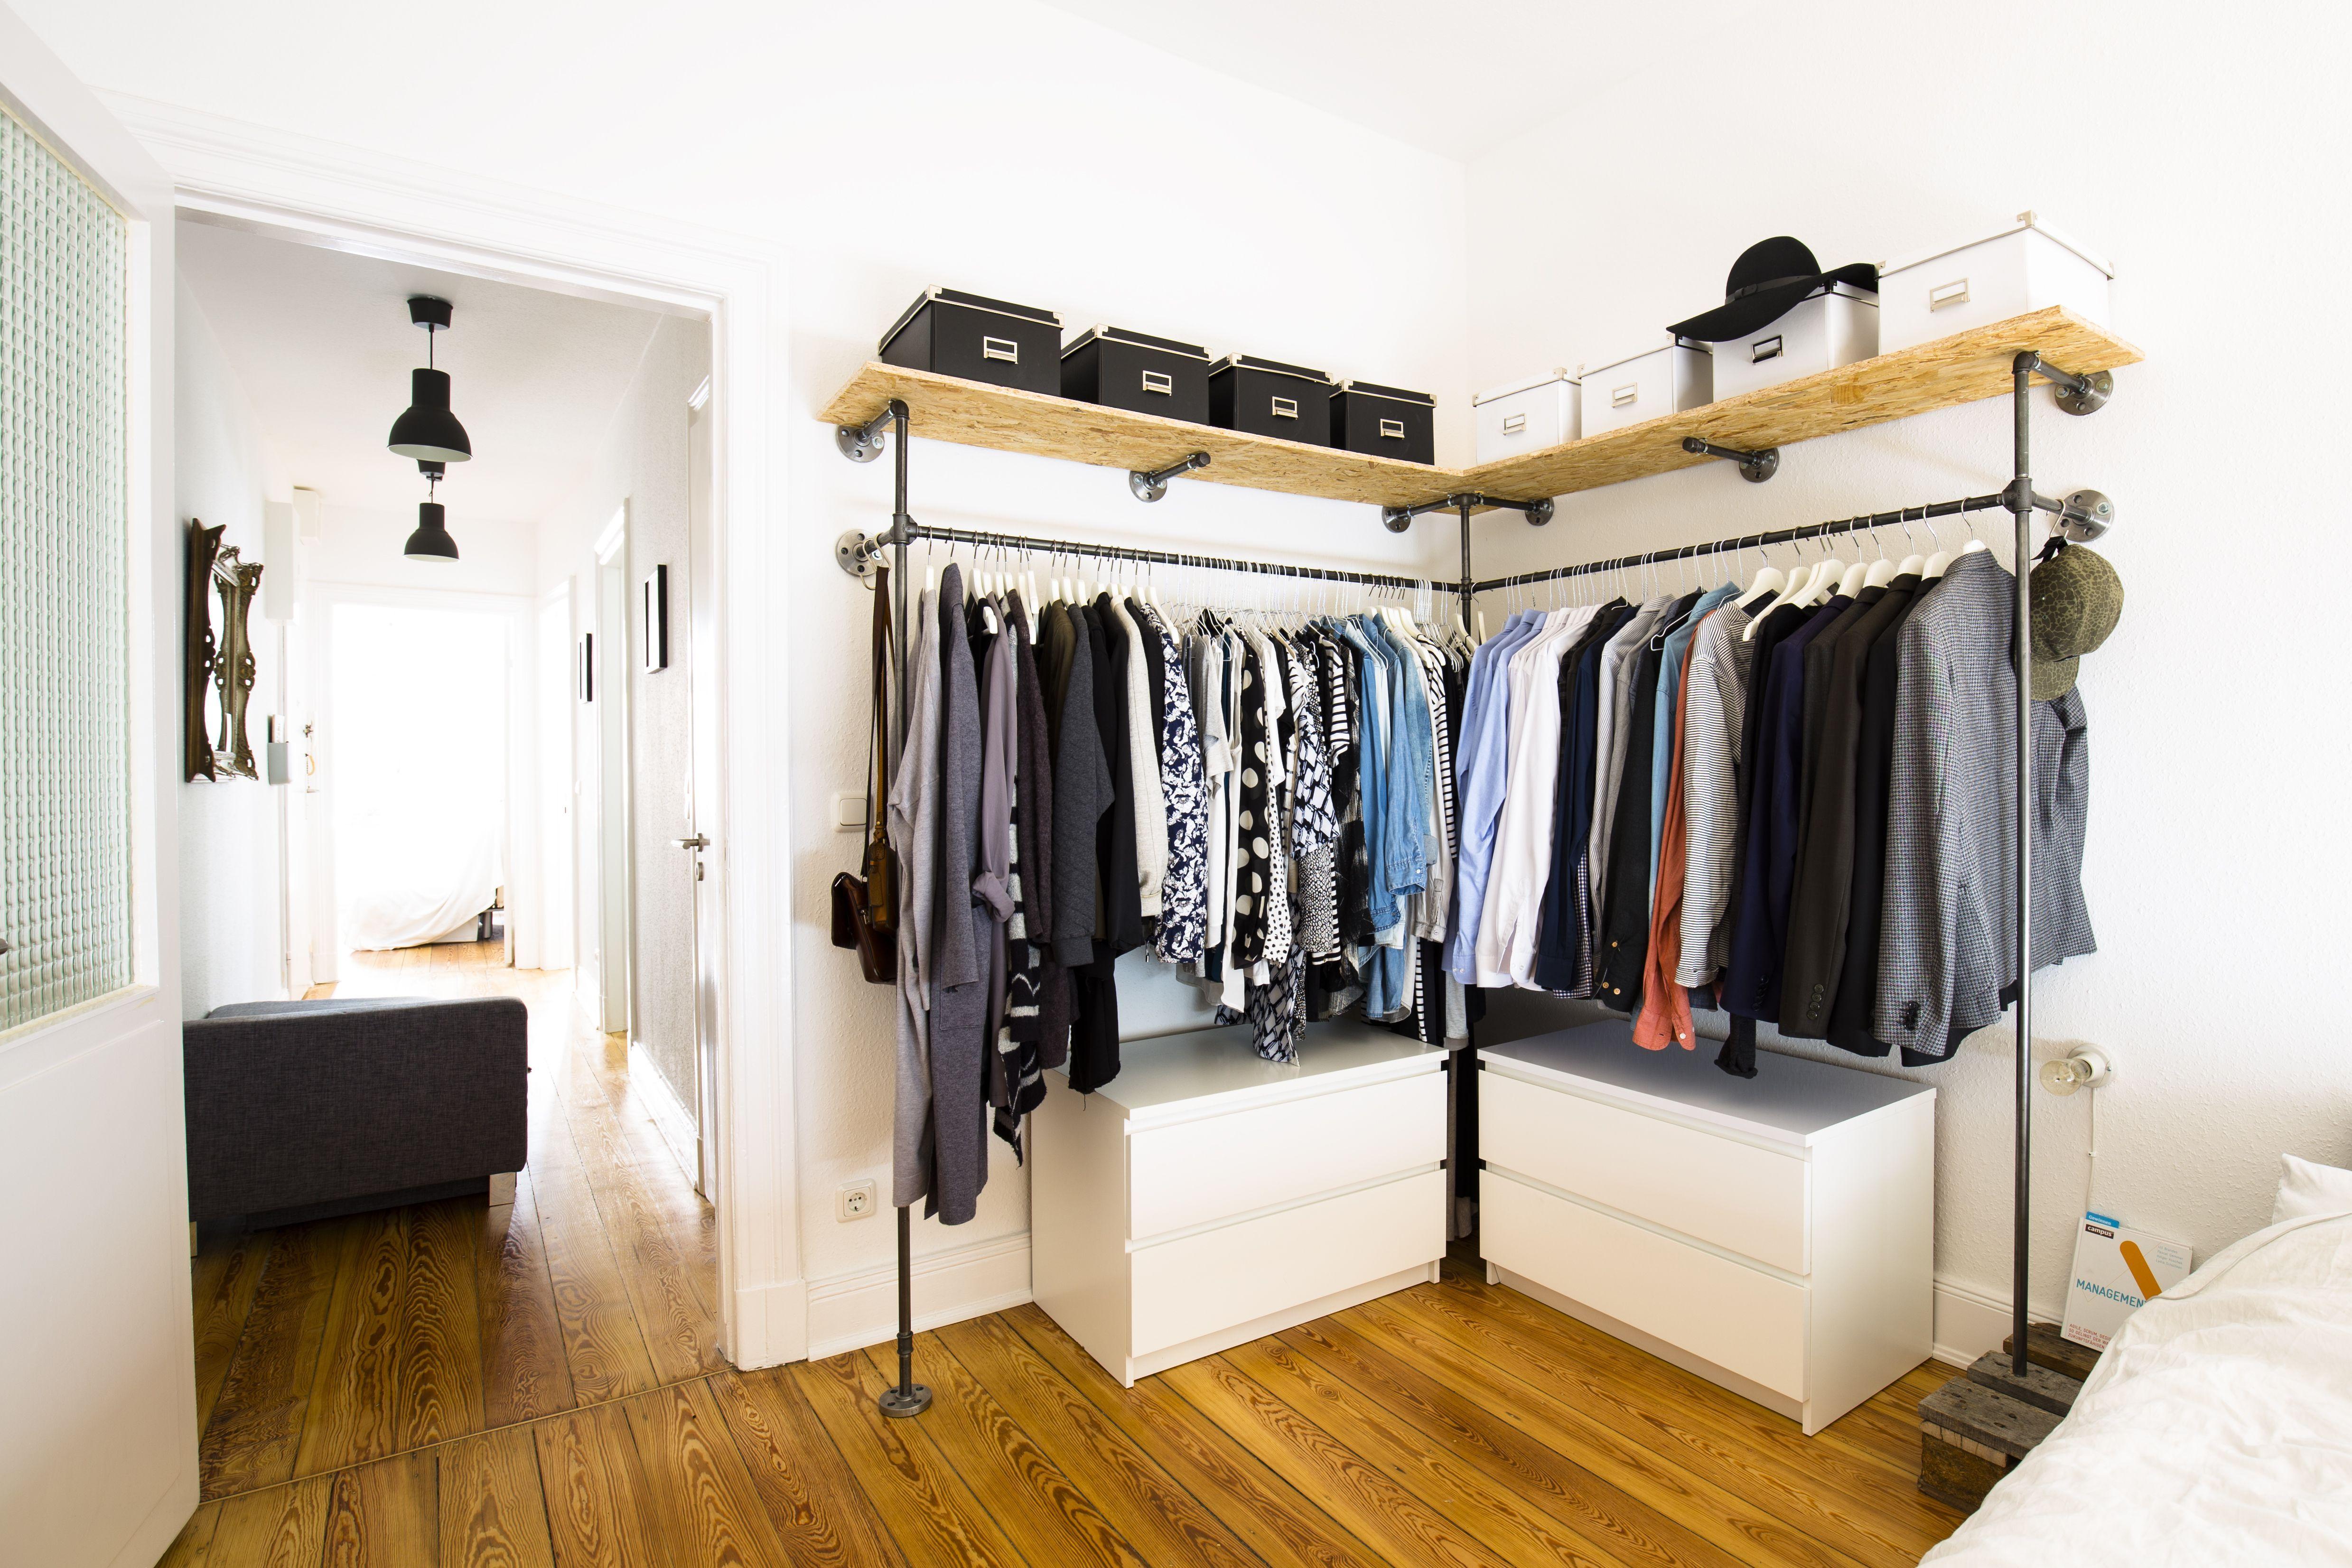 Offener Kleiderschrank Kleiderstange Garderobe Industrial Design Ind Design Garderobe Ind Indust In 2020 Open Wardrobe Clothing Rack Bedroom Clothes Rail